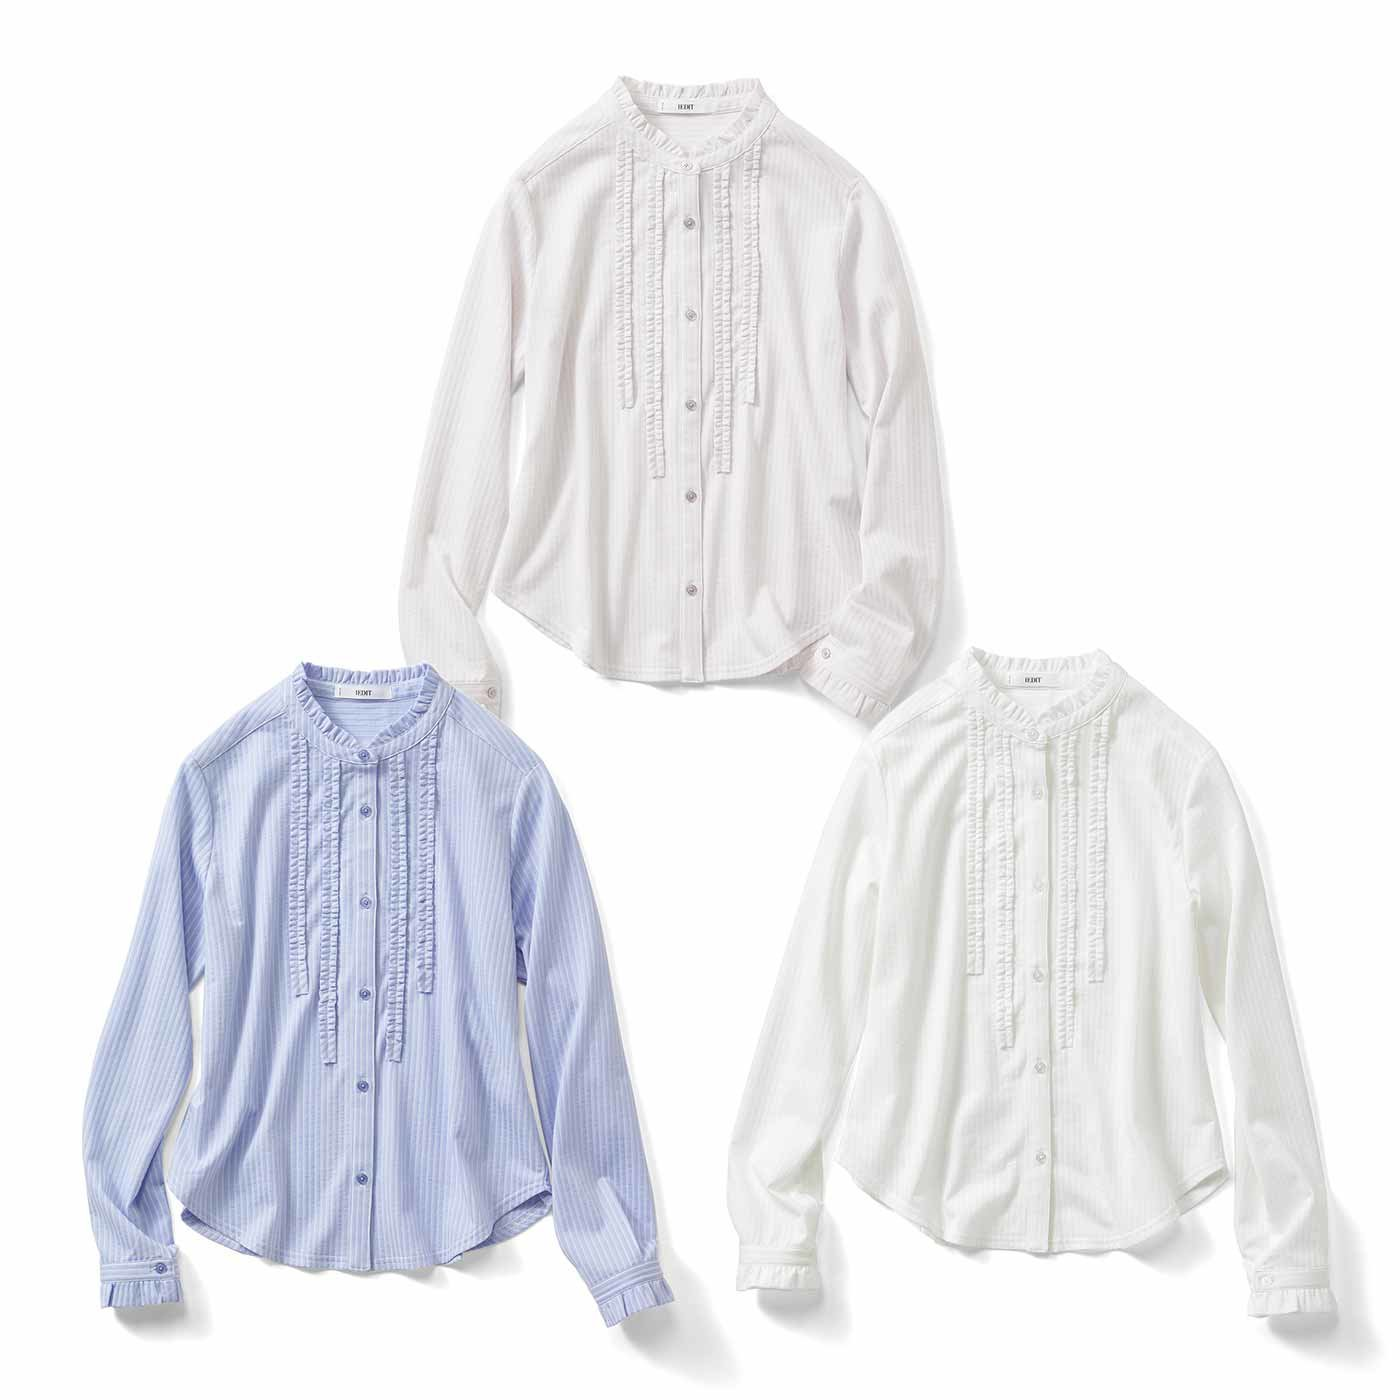 IEDIT[イディット] バンドカラーにフリルが知的フェミニンな吸汗速乾カットソーシャツの会